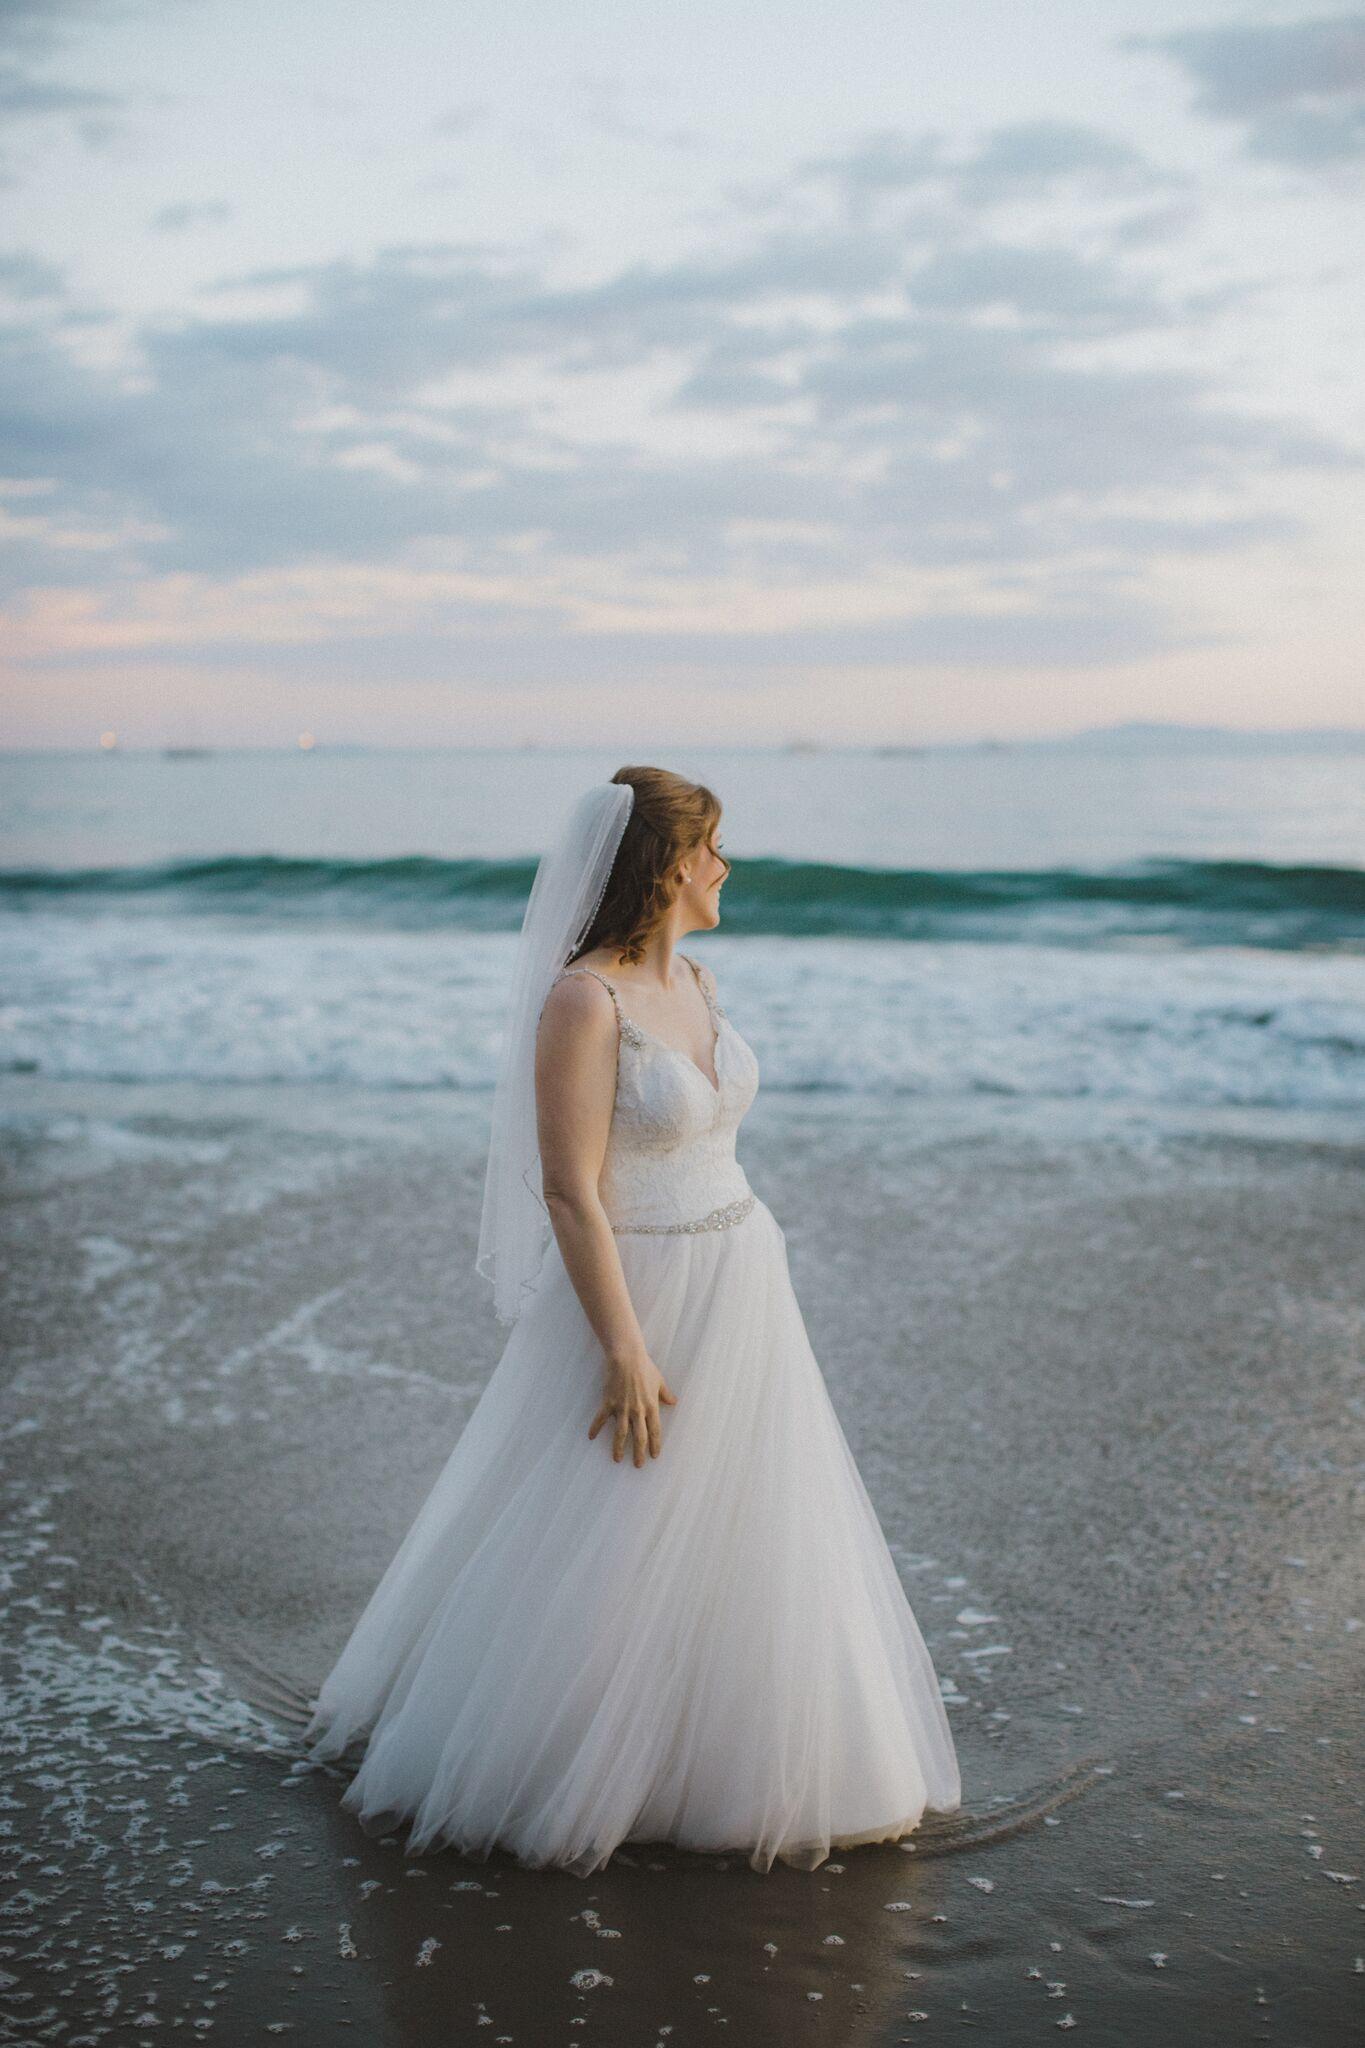 www.santabarbawedding.com | Venue: Santa Barbara Courthouse | Photography: Ryanne Bee Photography | Officiant: Santa Barbara Classic Weddings | Bride Looking at the Ocean